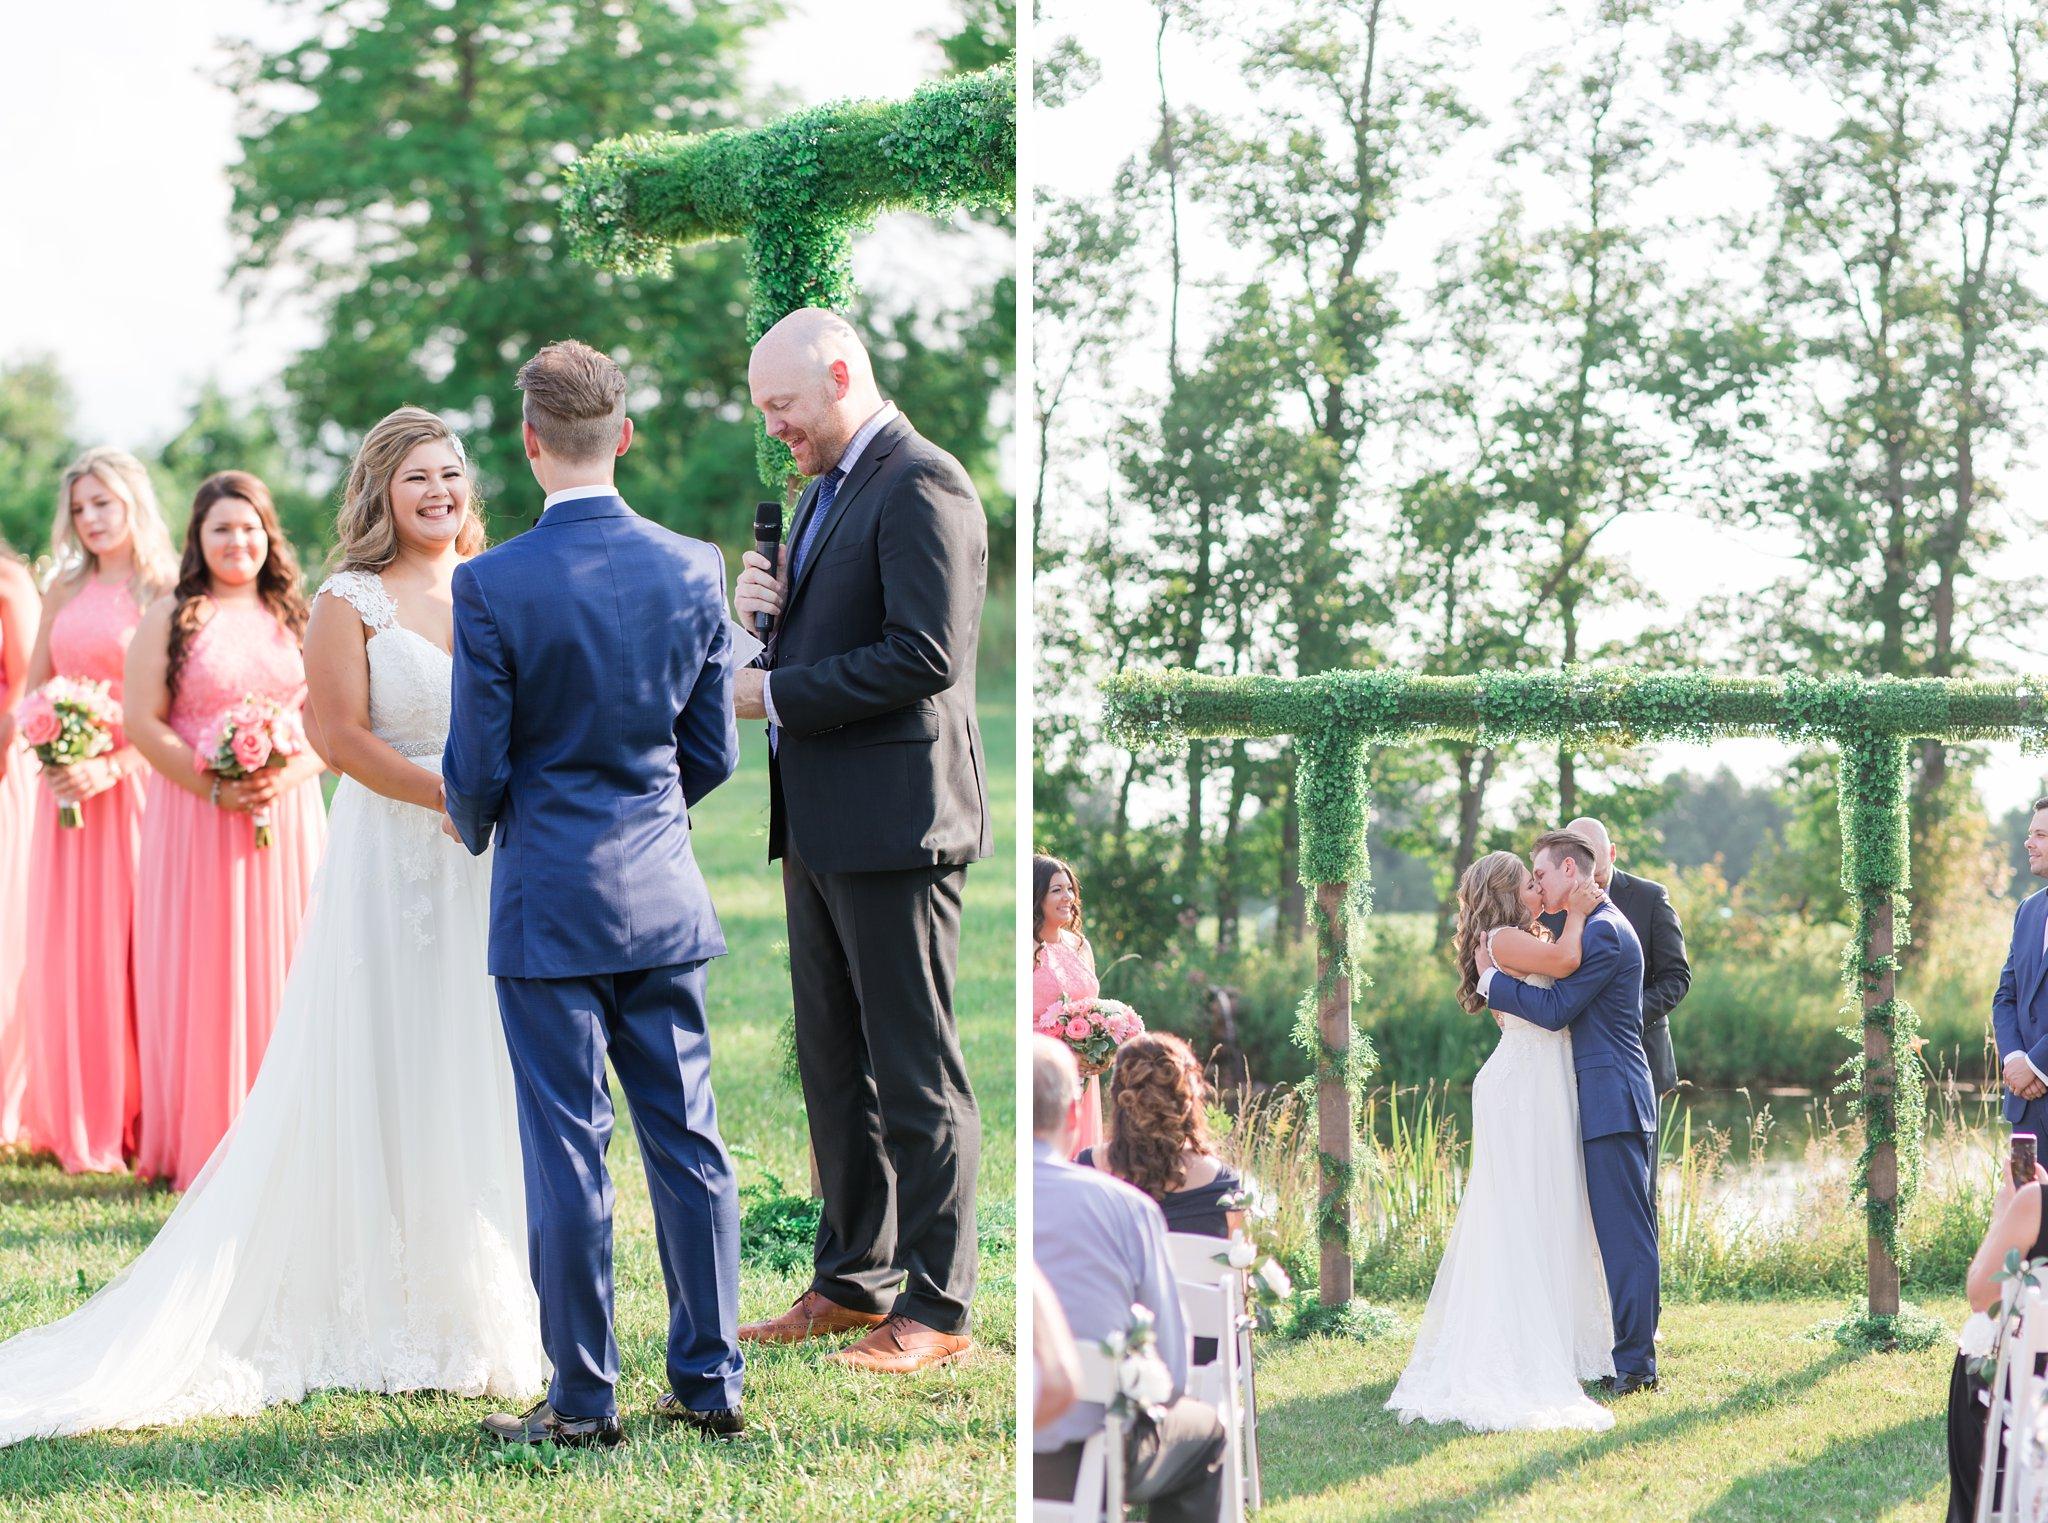 first kiss by the pond Vineyard wedding at Jabulani Amy Pinder Photography